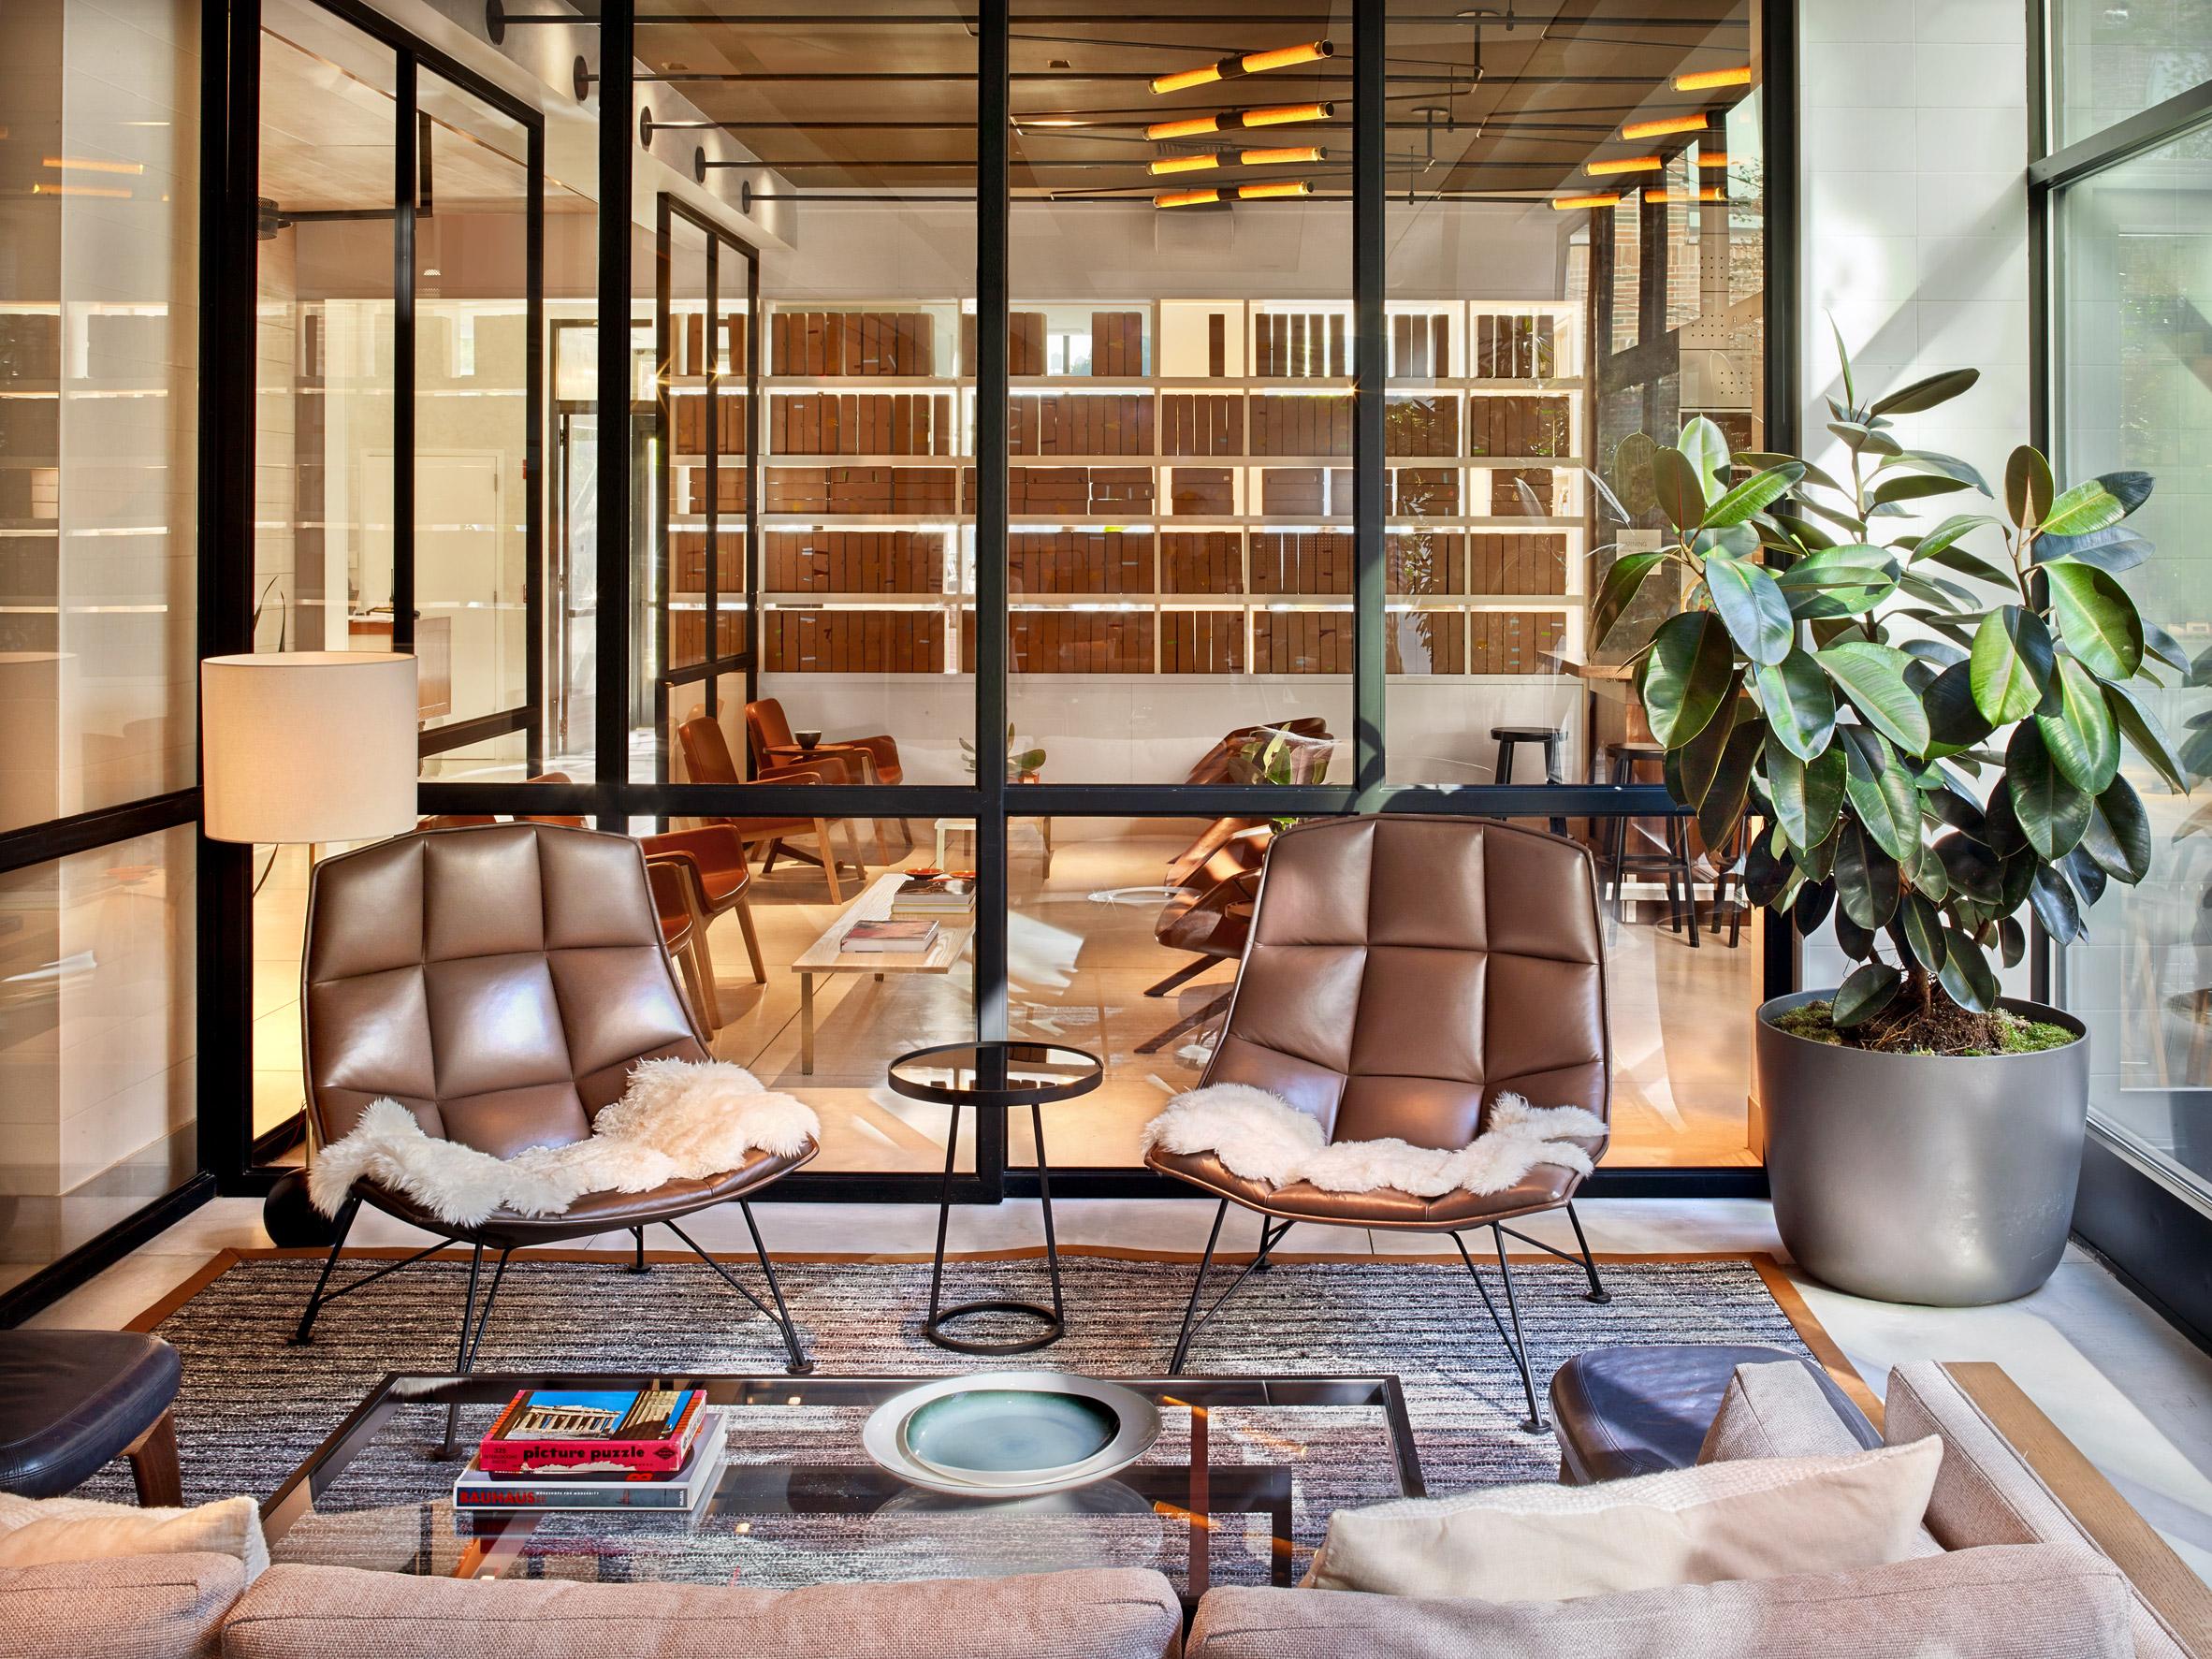 architecture-new-york-city-micro-hotel-design-studia-interiors-osnovadesign-osnova-poltava_06